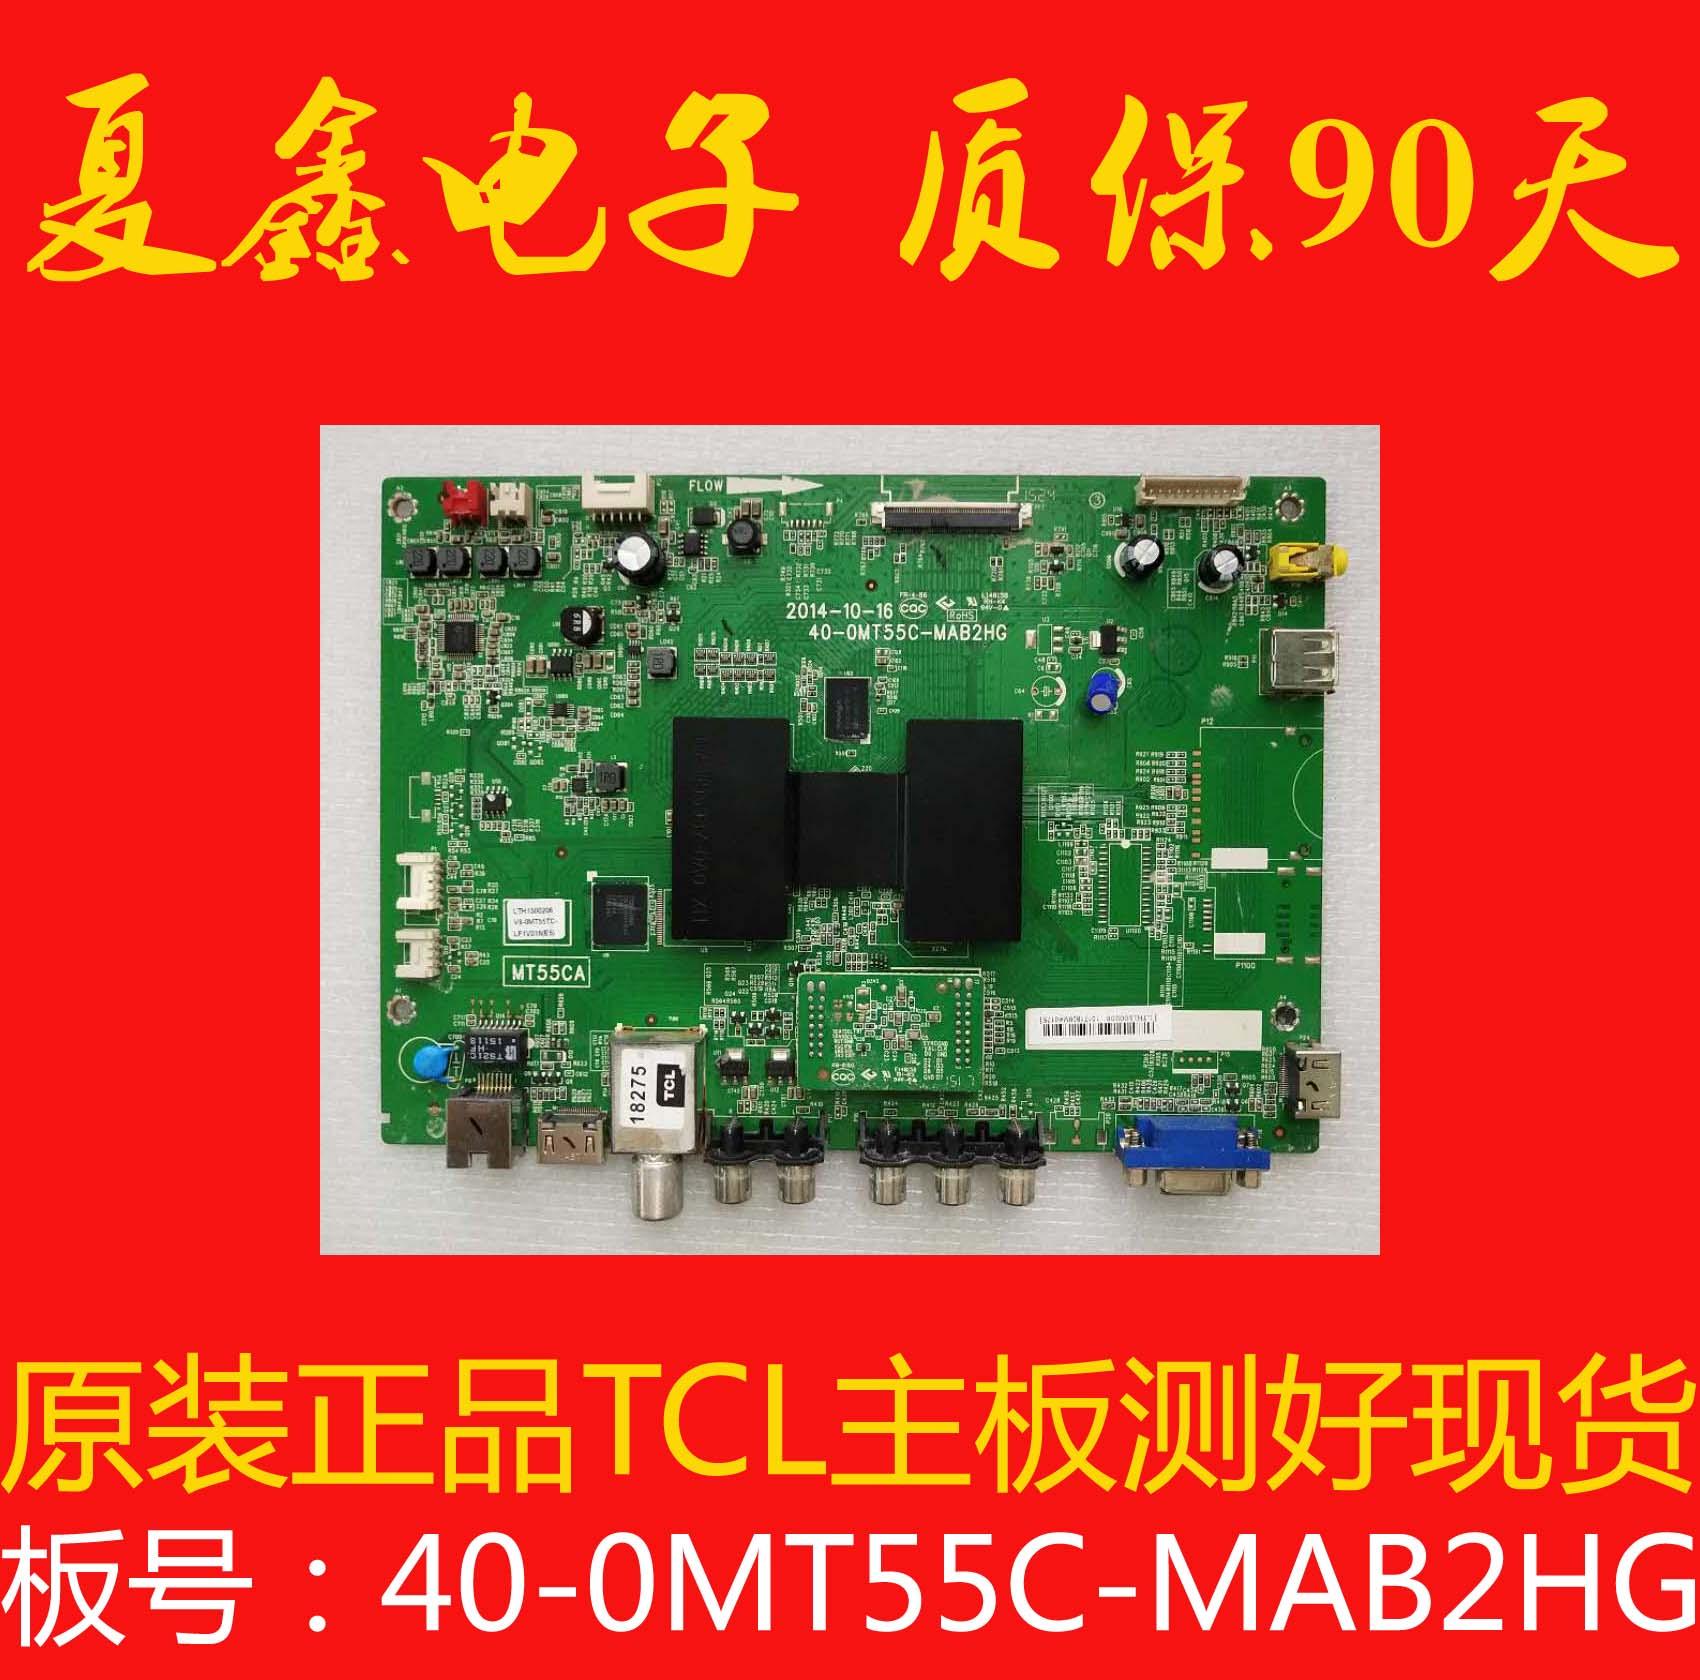 测好!原装TCL B43A380主板40-0MT55C-MAB2HG屏LVF430AU0T E3 V2